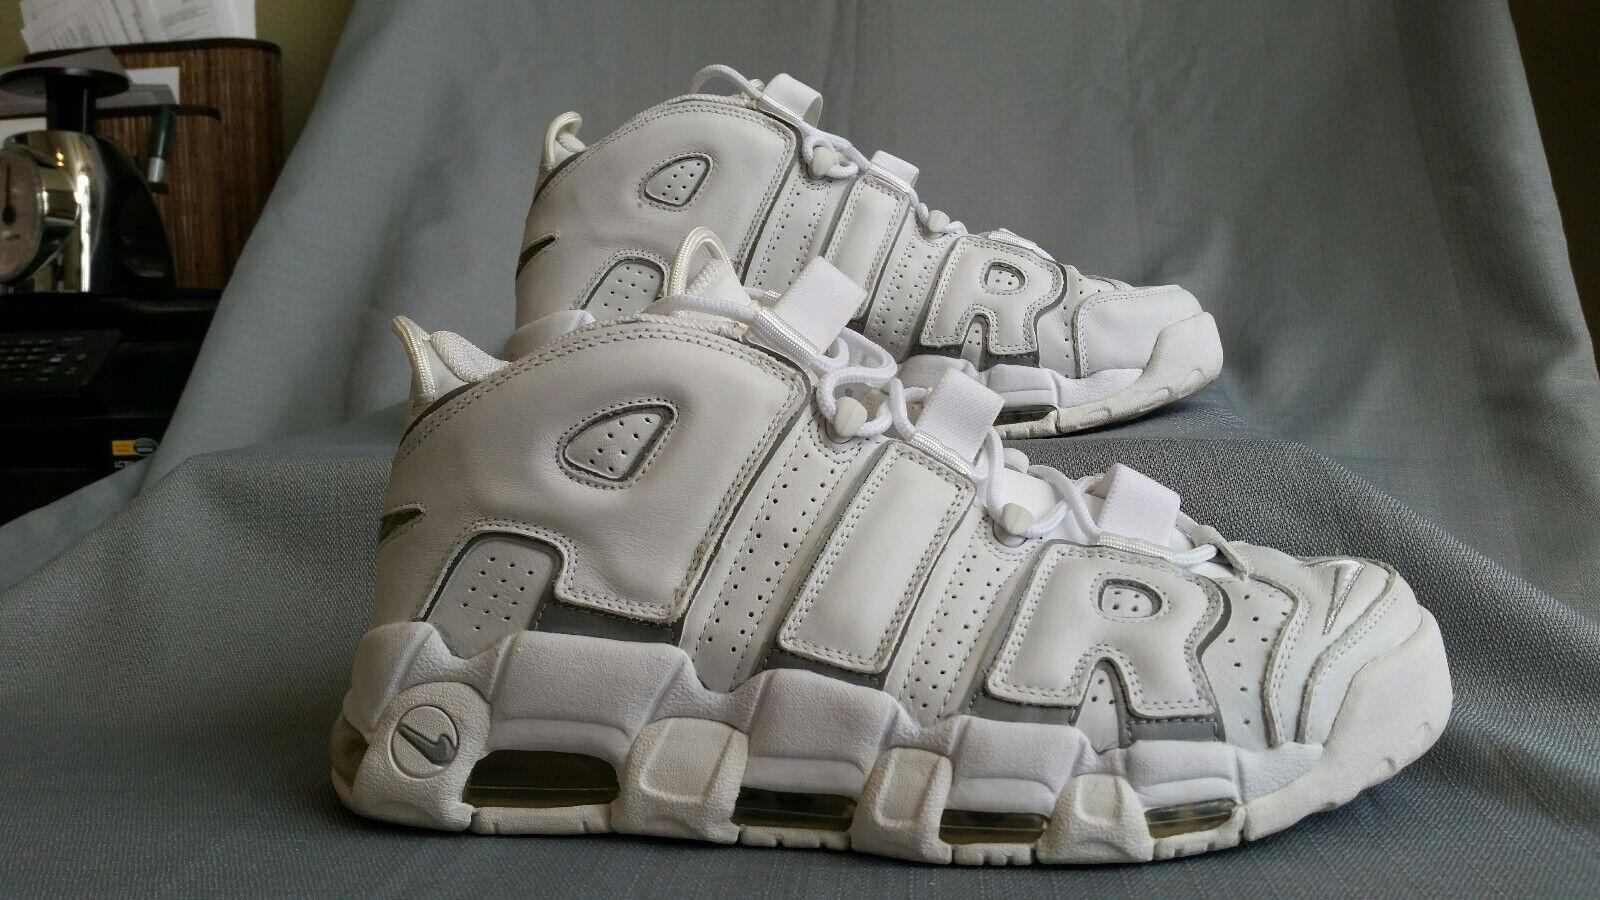 NIKE AIR MORE UPTEMPO B White 2002 Pippen shoes 303904-101 Size 12 Men's RARE